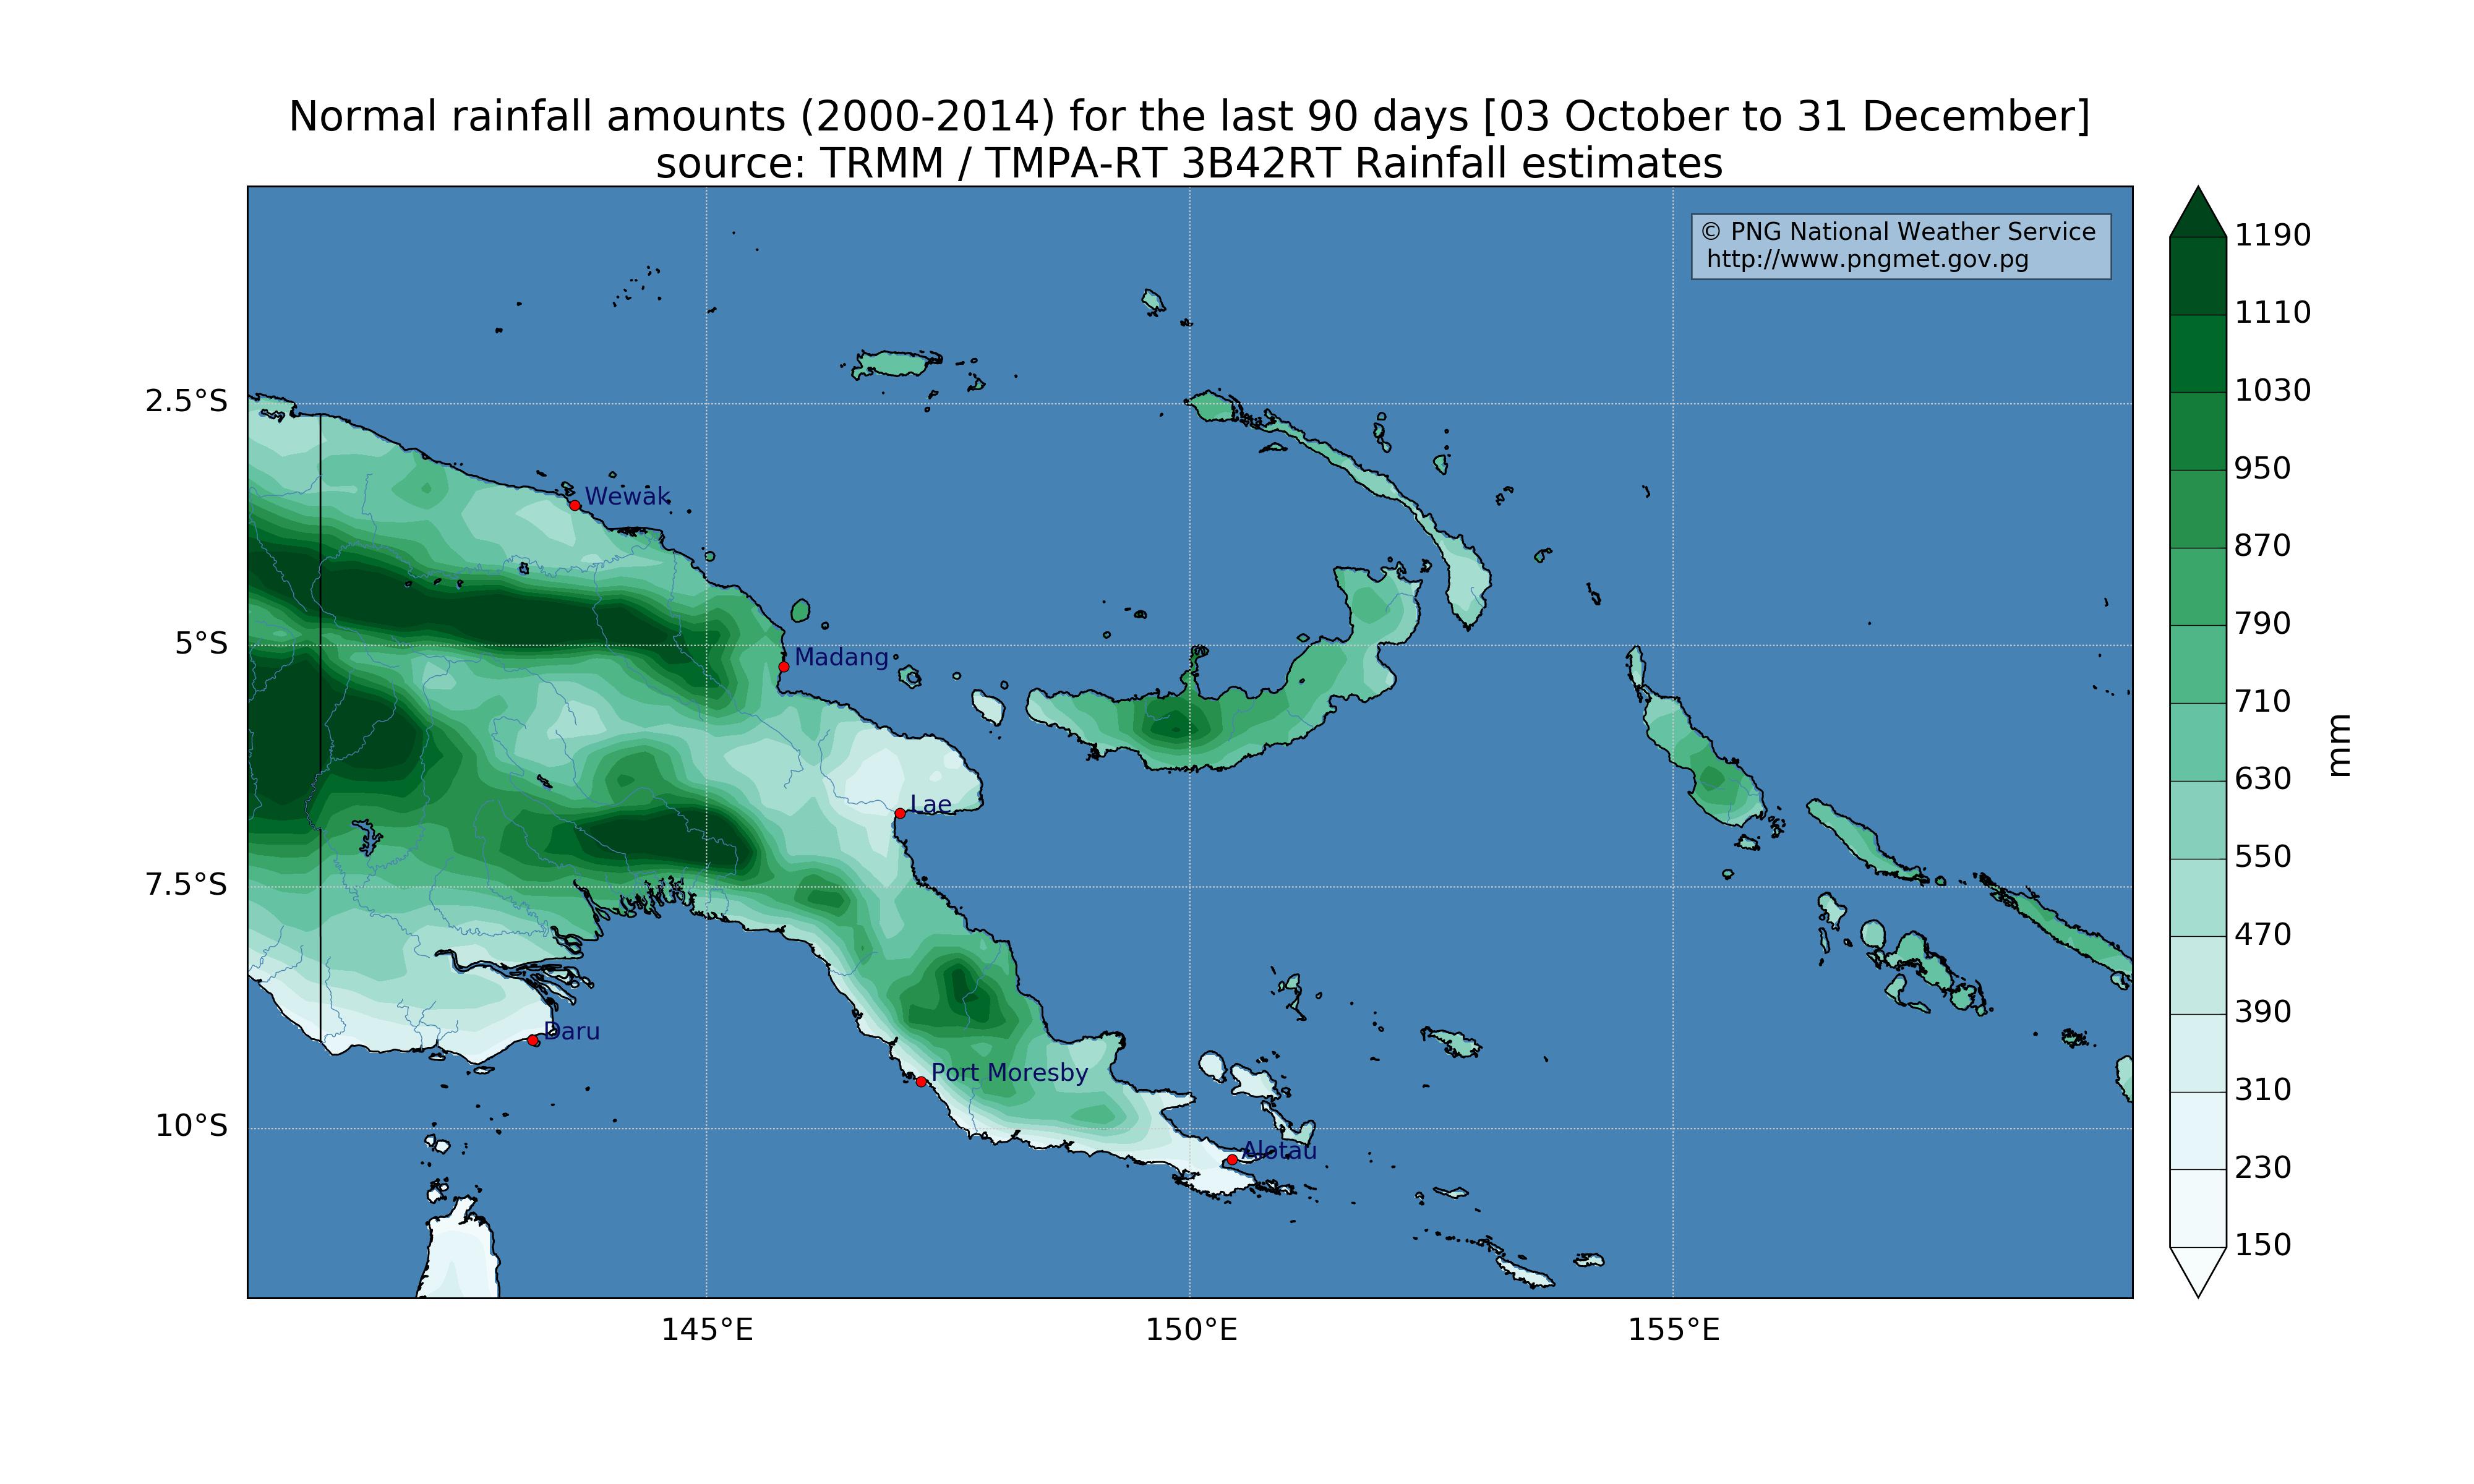 climatology (2000 - 2014 average) for the last 90 days